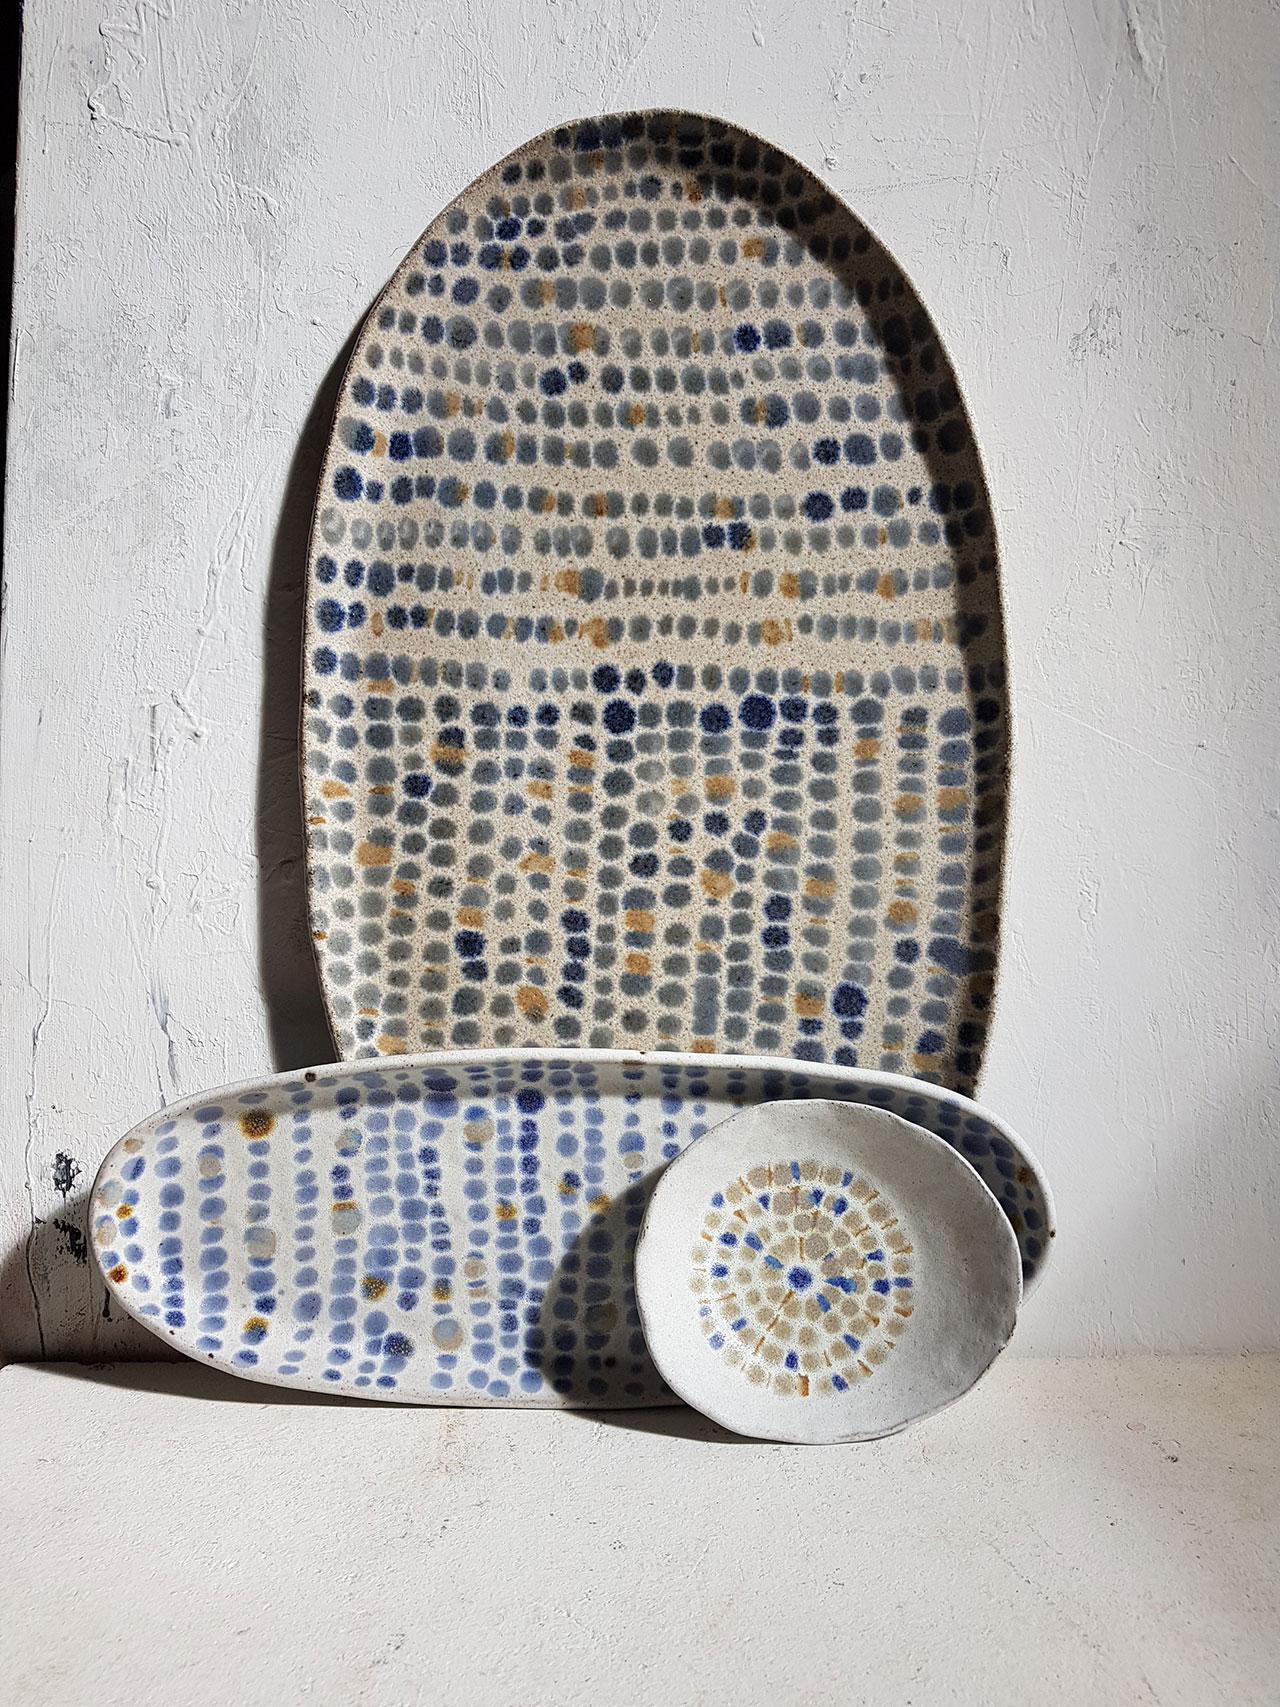 Homatino Ceramics (Efcharis Paltoglou), Athens.Courtesy Mon Coin Studio.